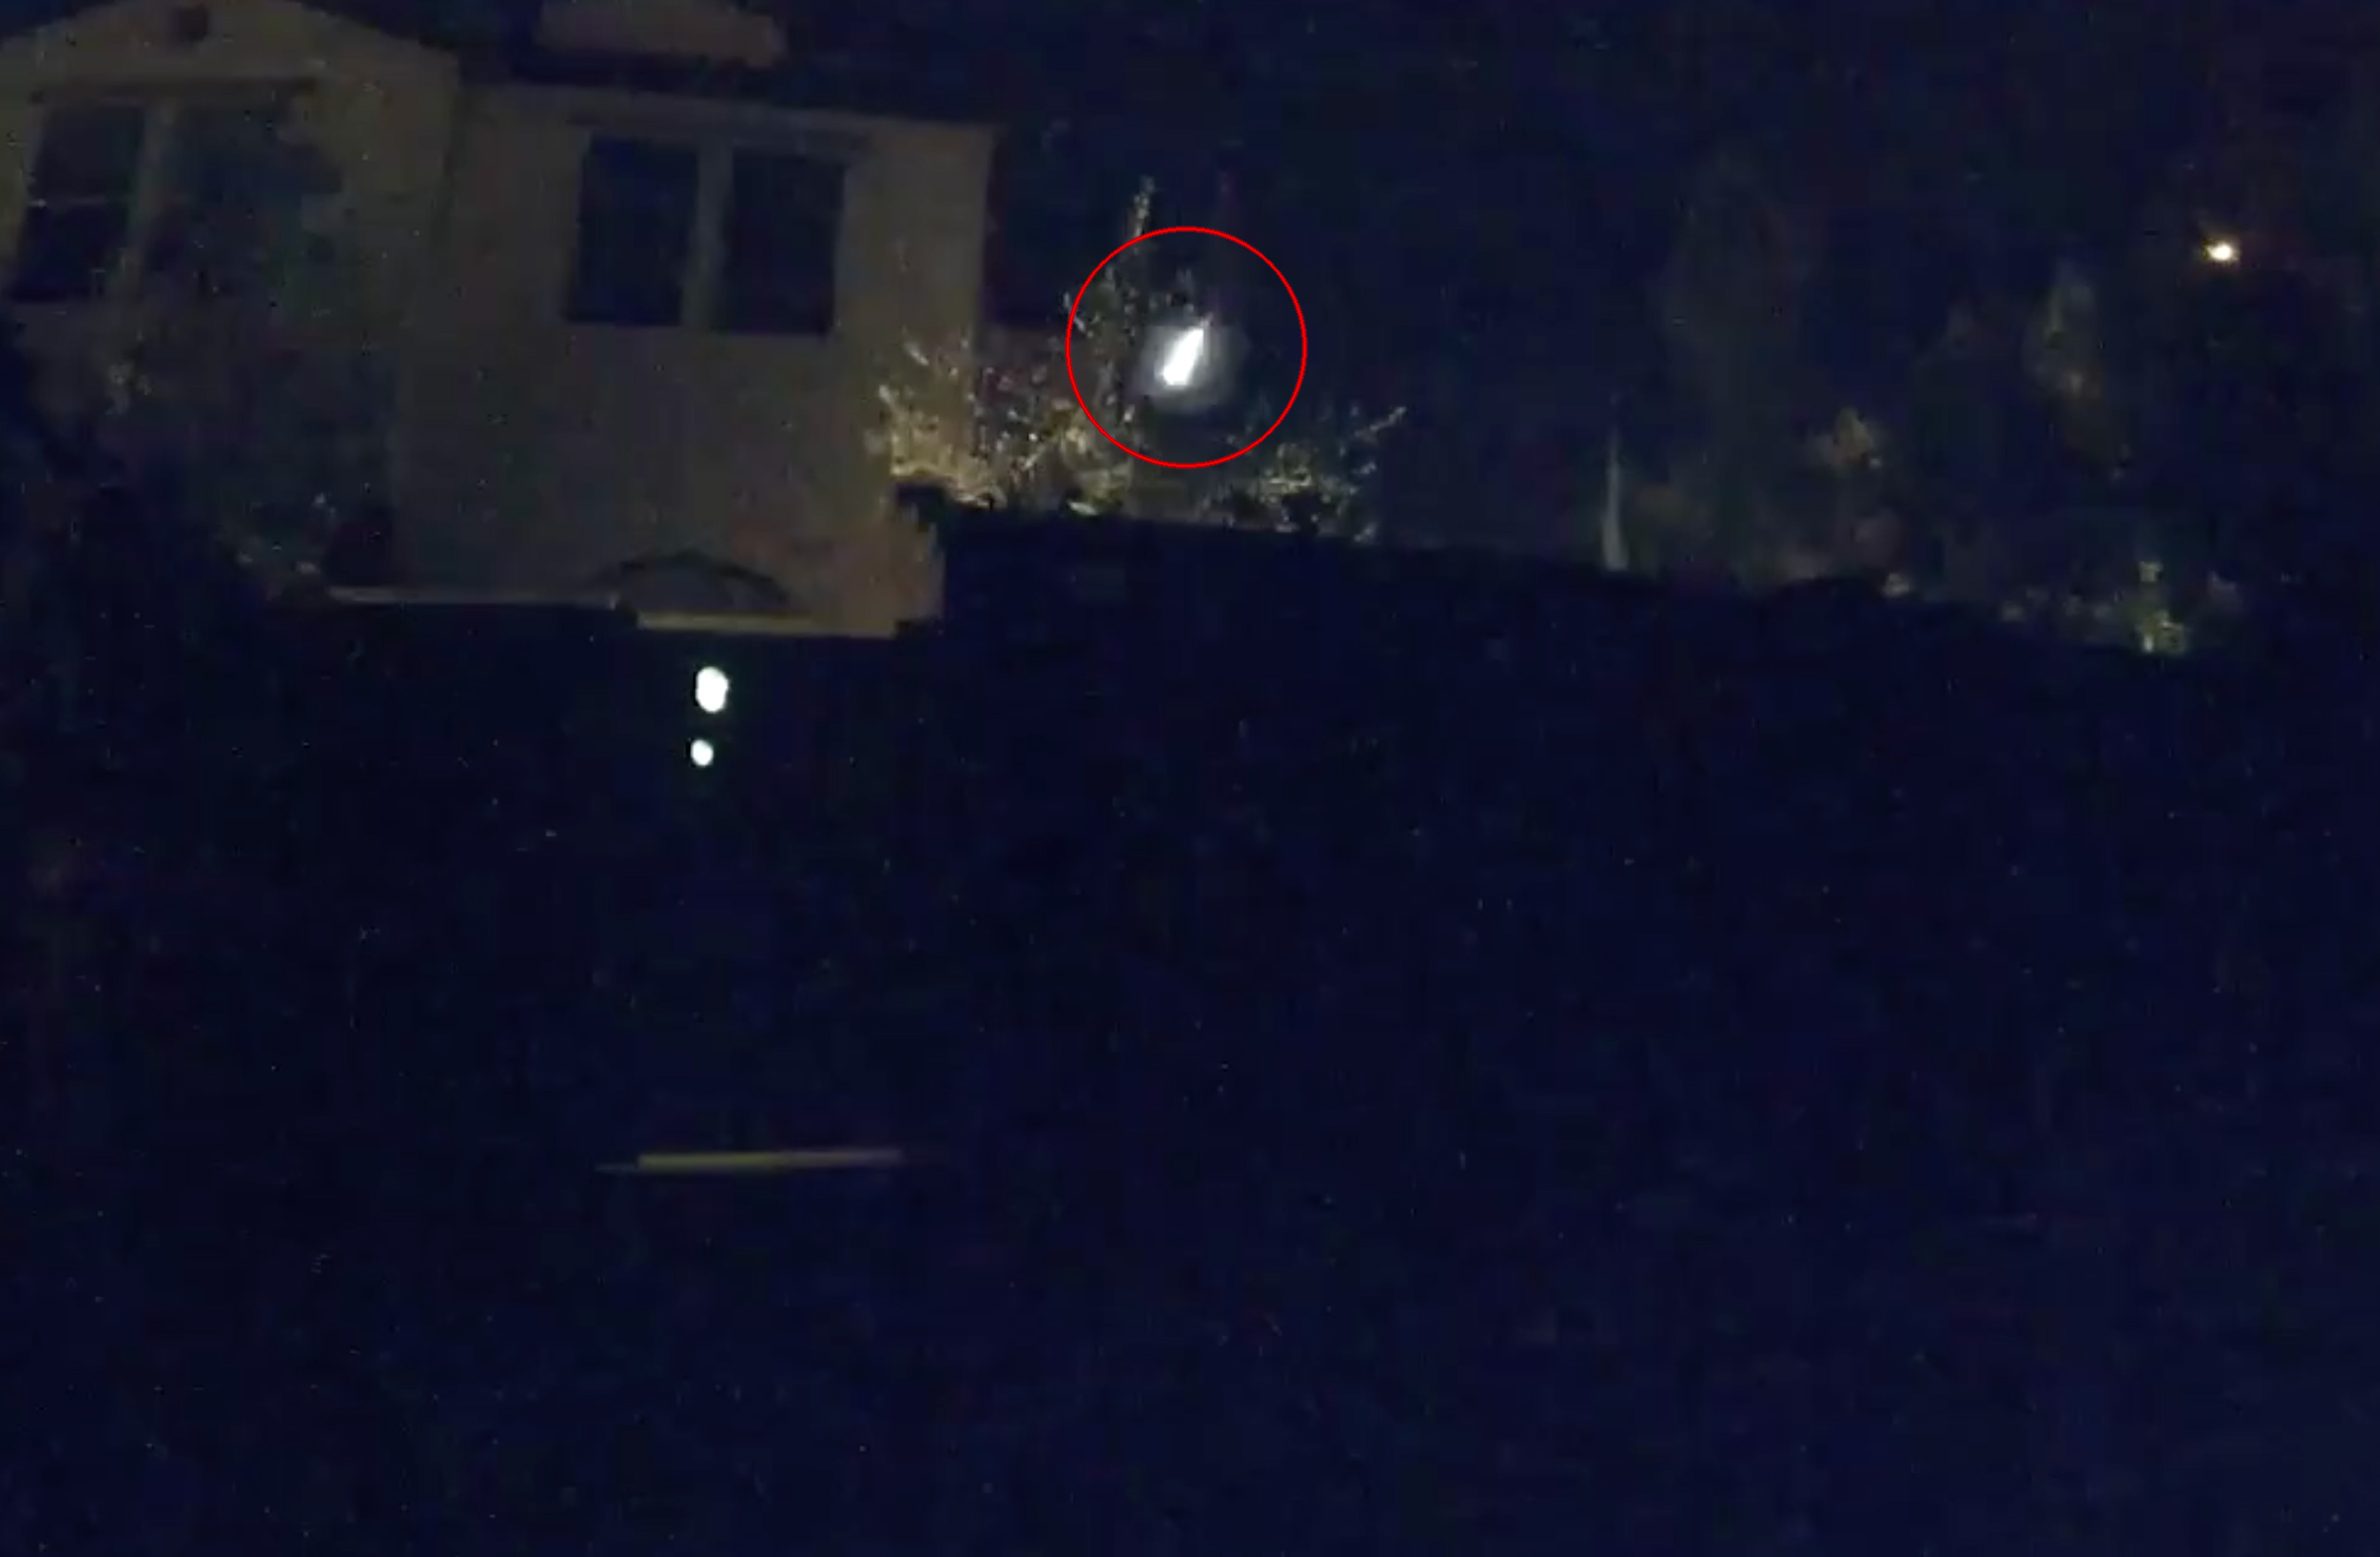 Taurid Meteor Shower Los Angeles